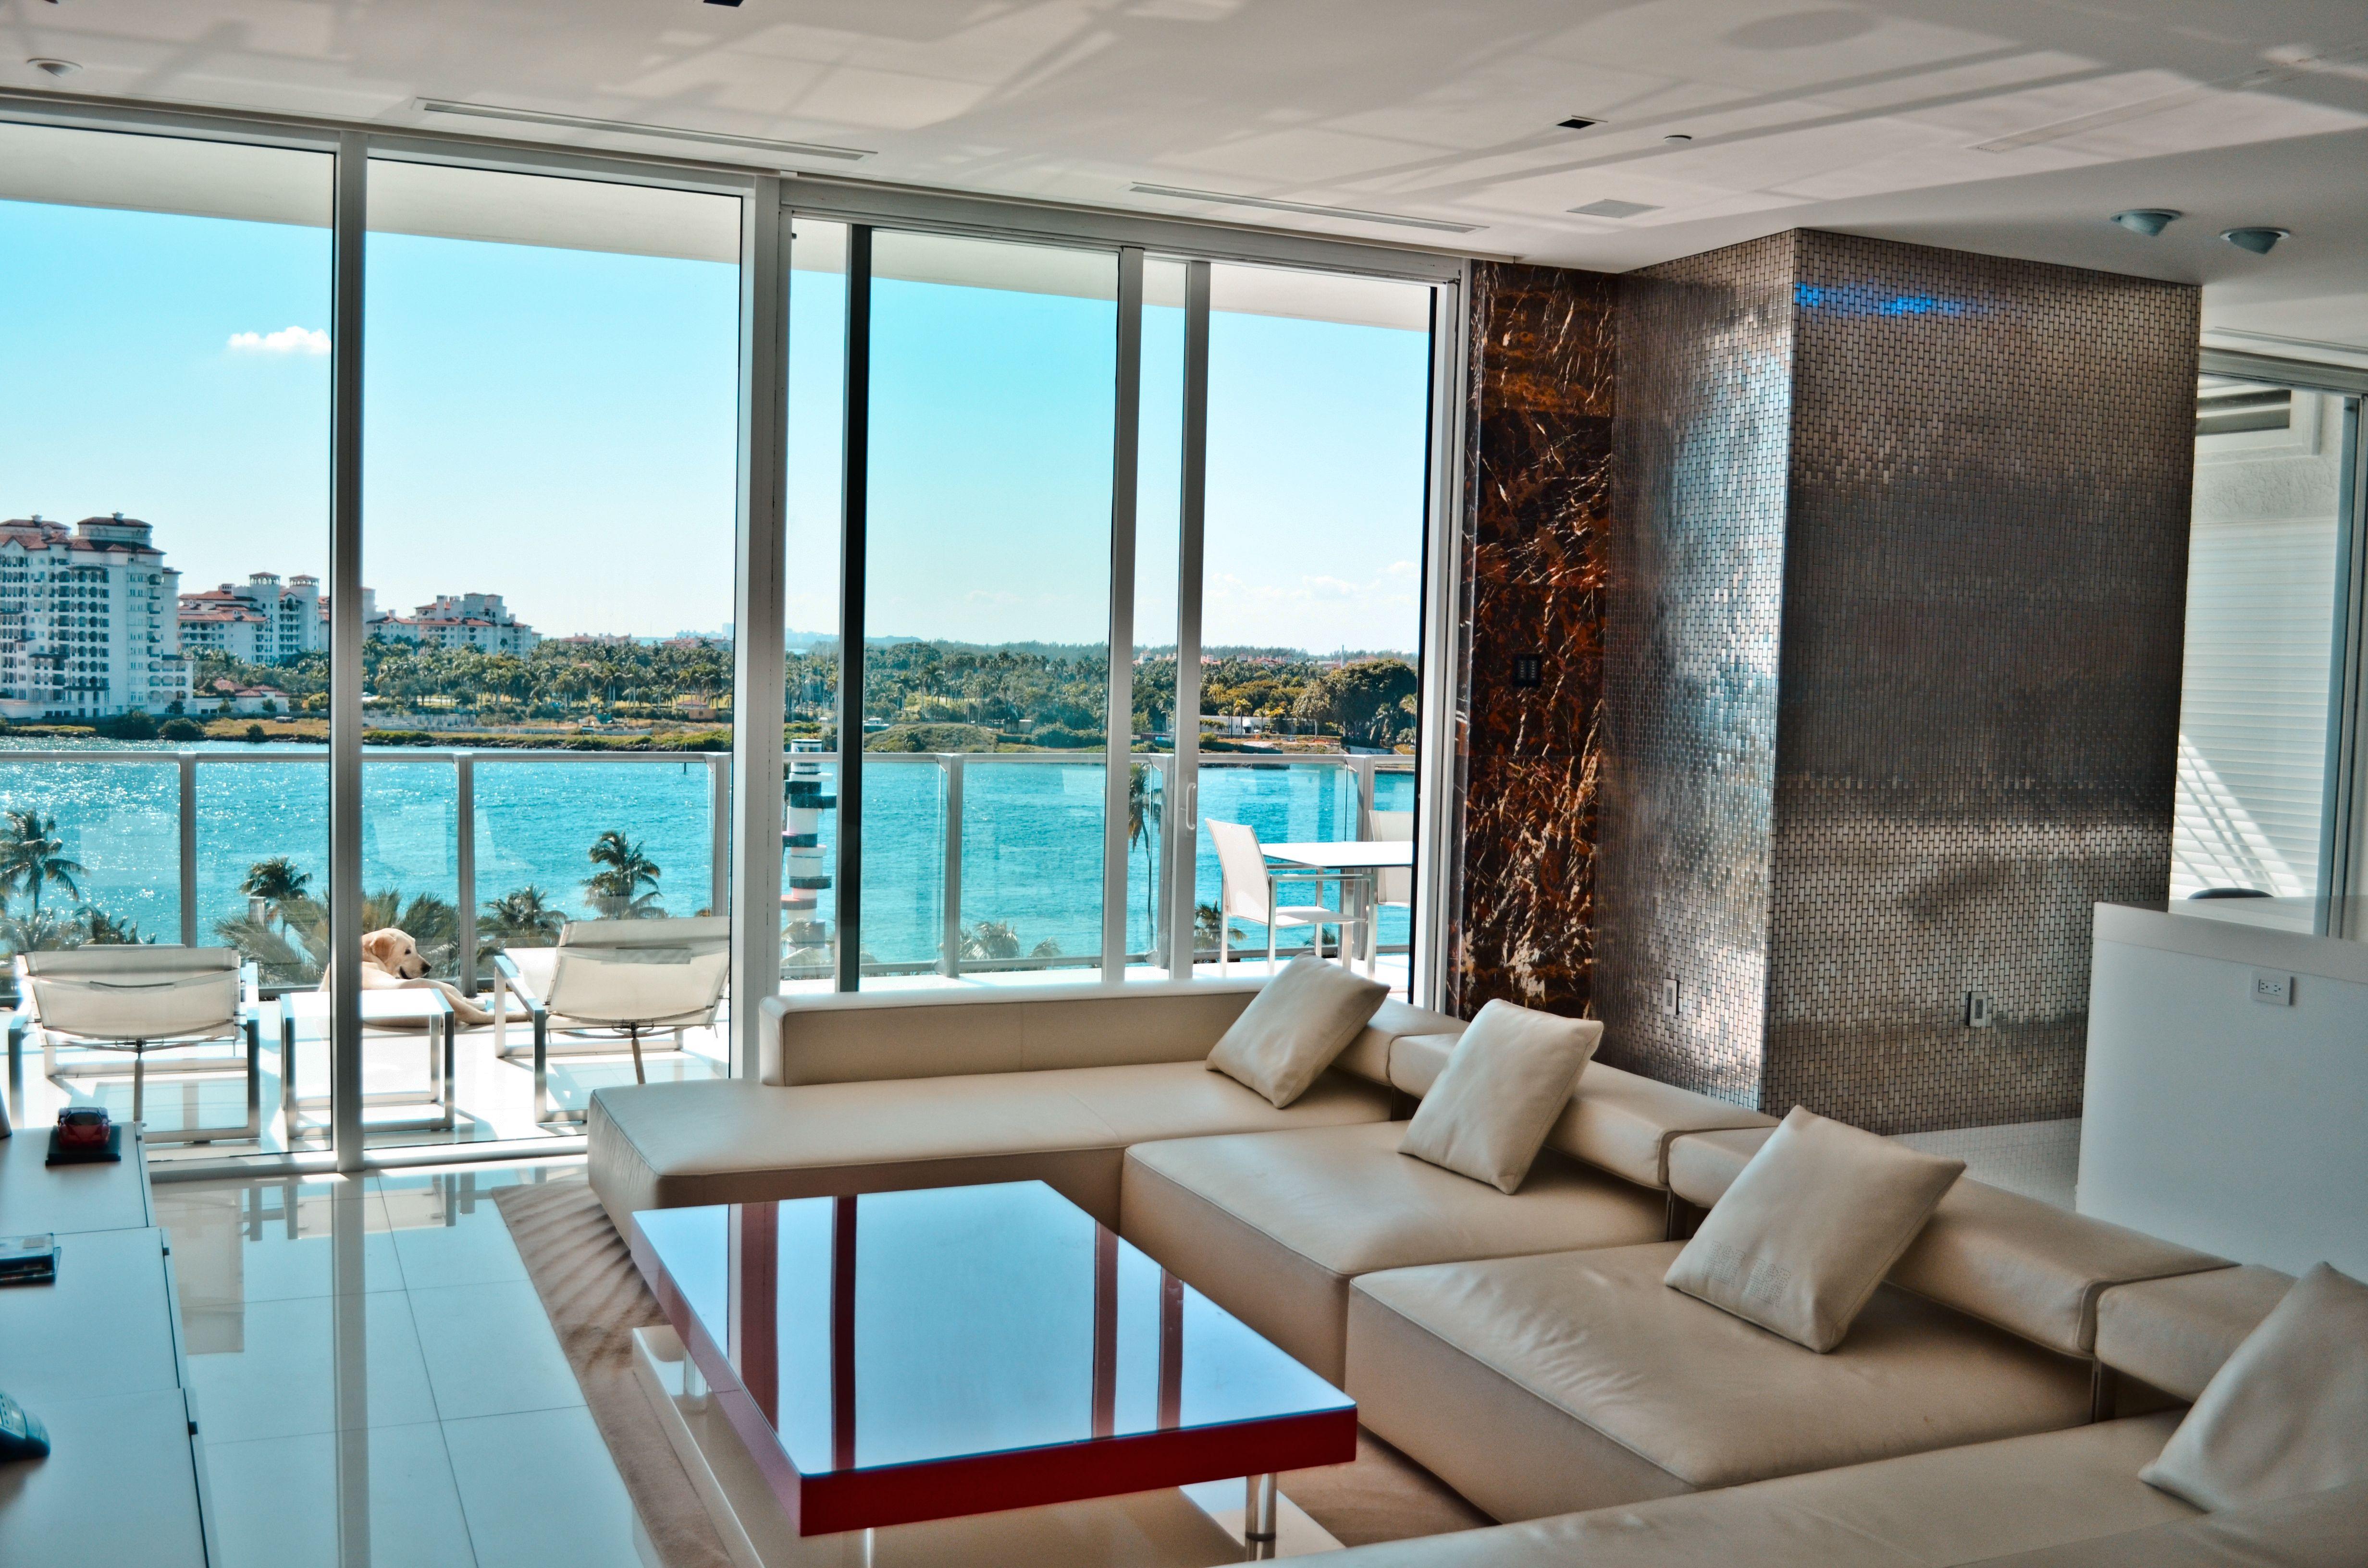 Living Room / Ocean View / Custom Furniture / Marble And Metallic Accents /  Modern / Contemporary / Miami Beach / South Beach / Apogee / Rockstar  Interiors